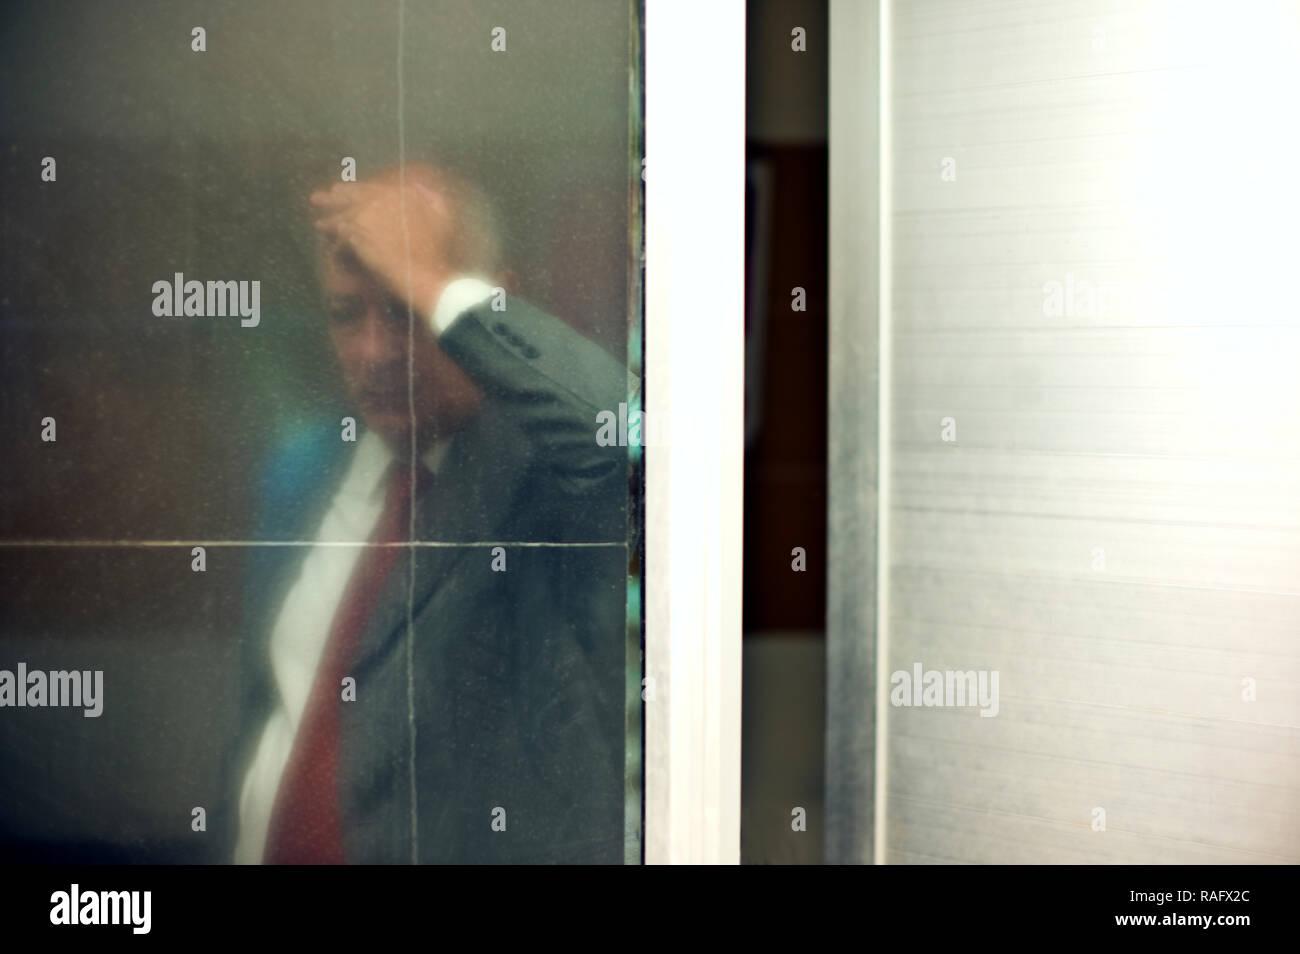 Senior businessman seen through glass door,  looking troubled. - Stock Image